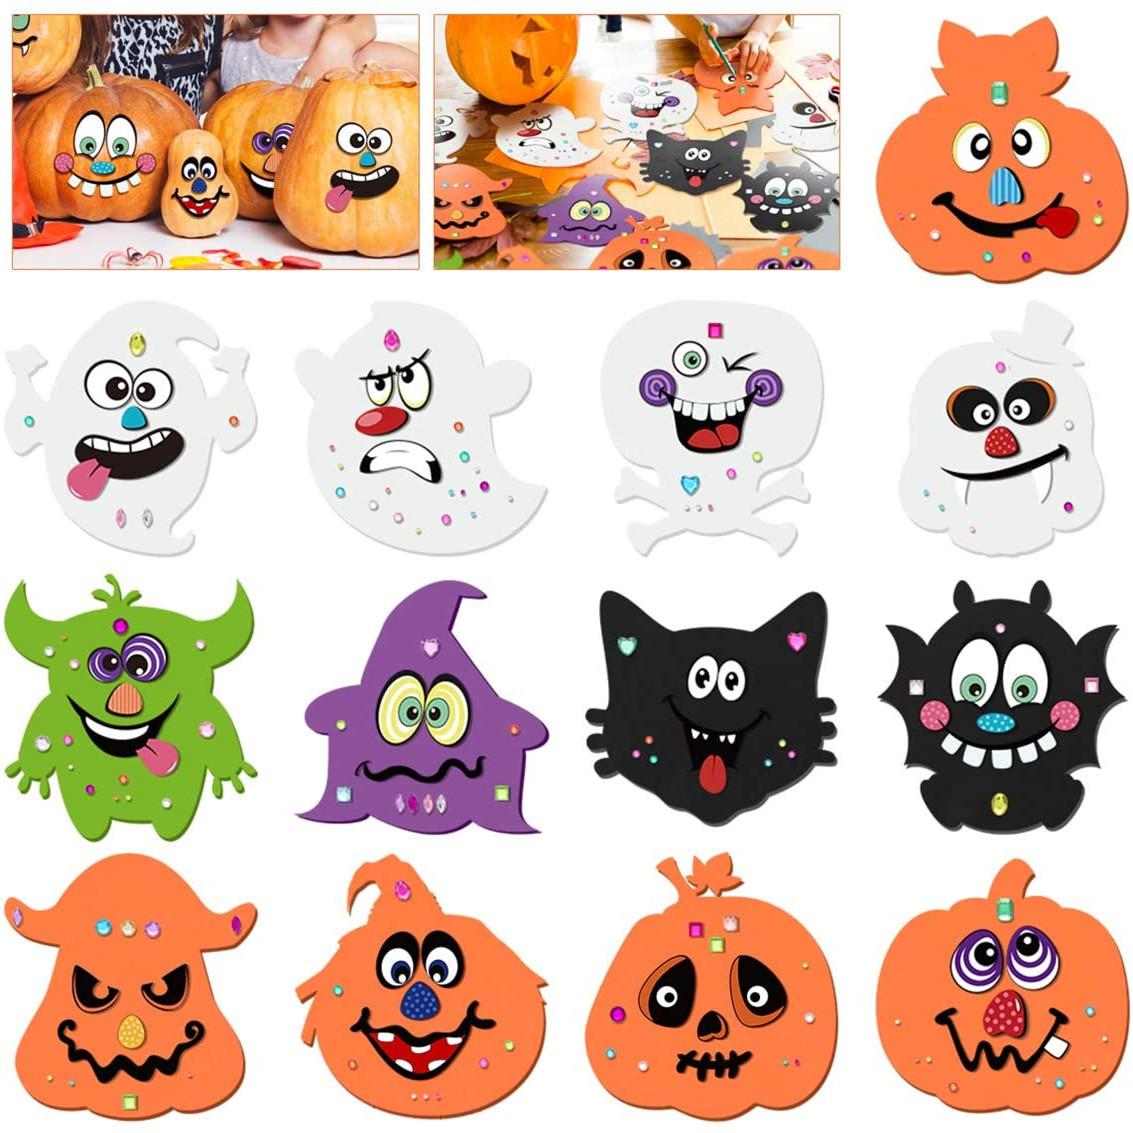 Halloween Crafts Kit for Kids, Foam DIY Pumpkin Decorating Stickers for Halloween Games